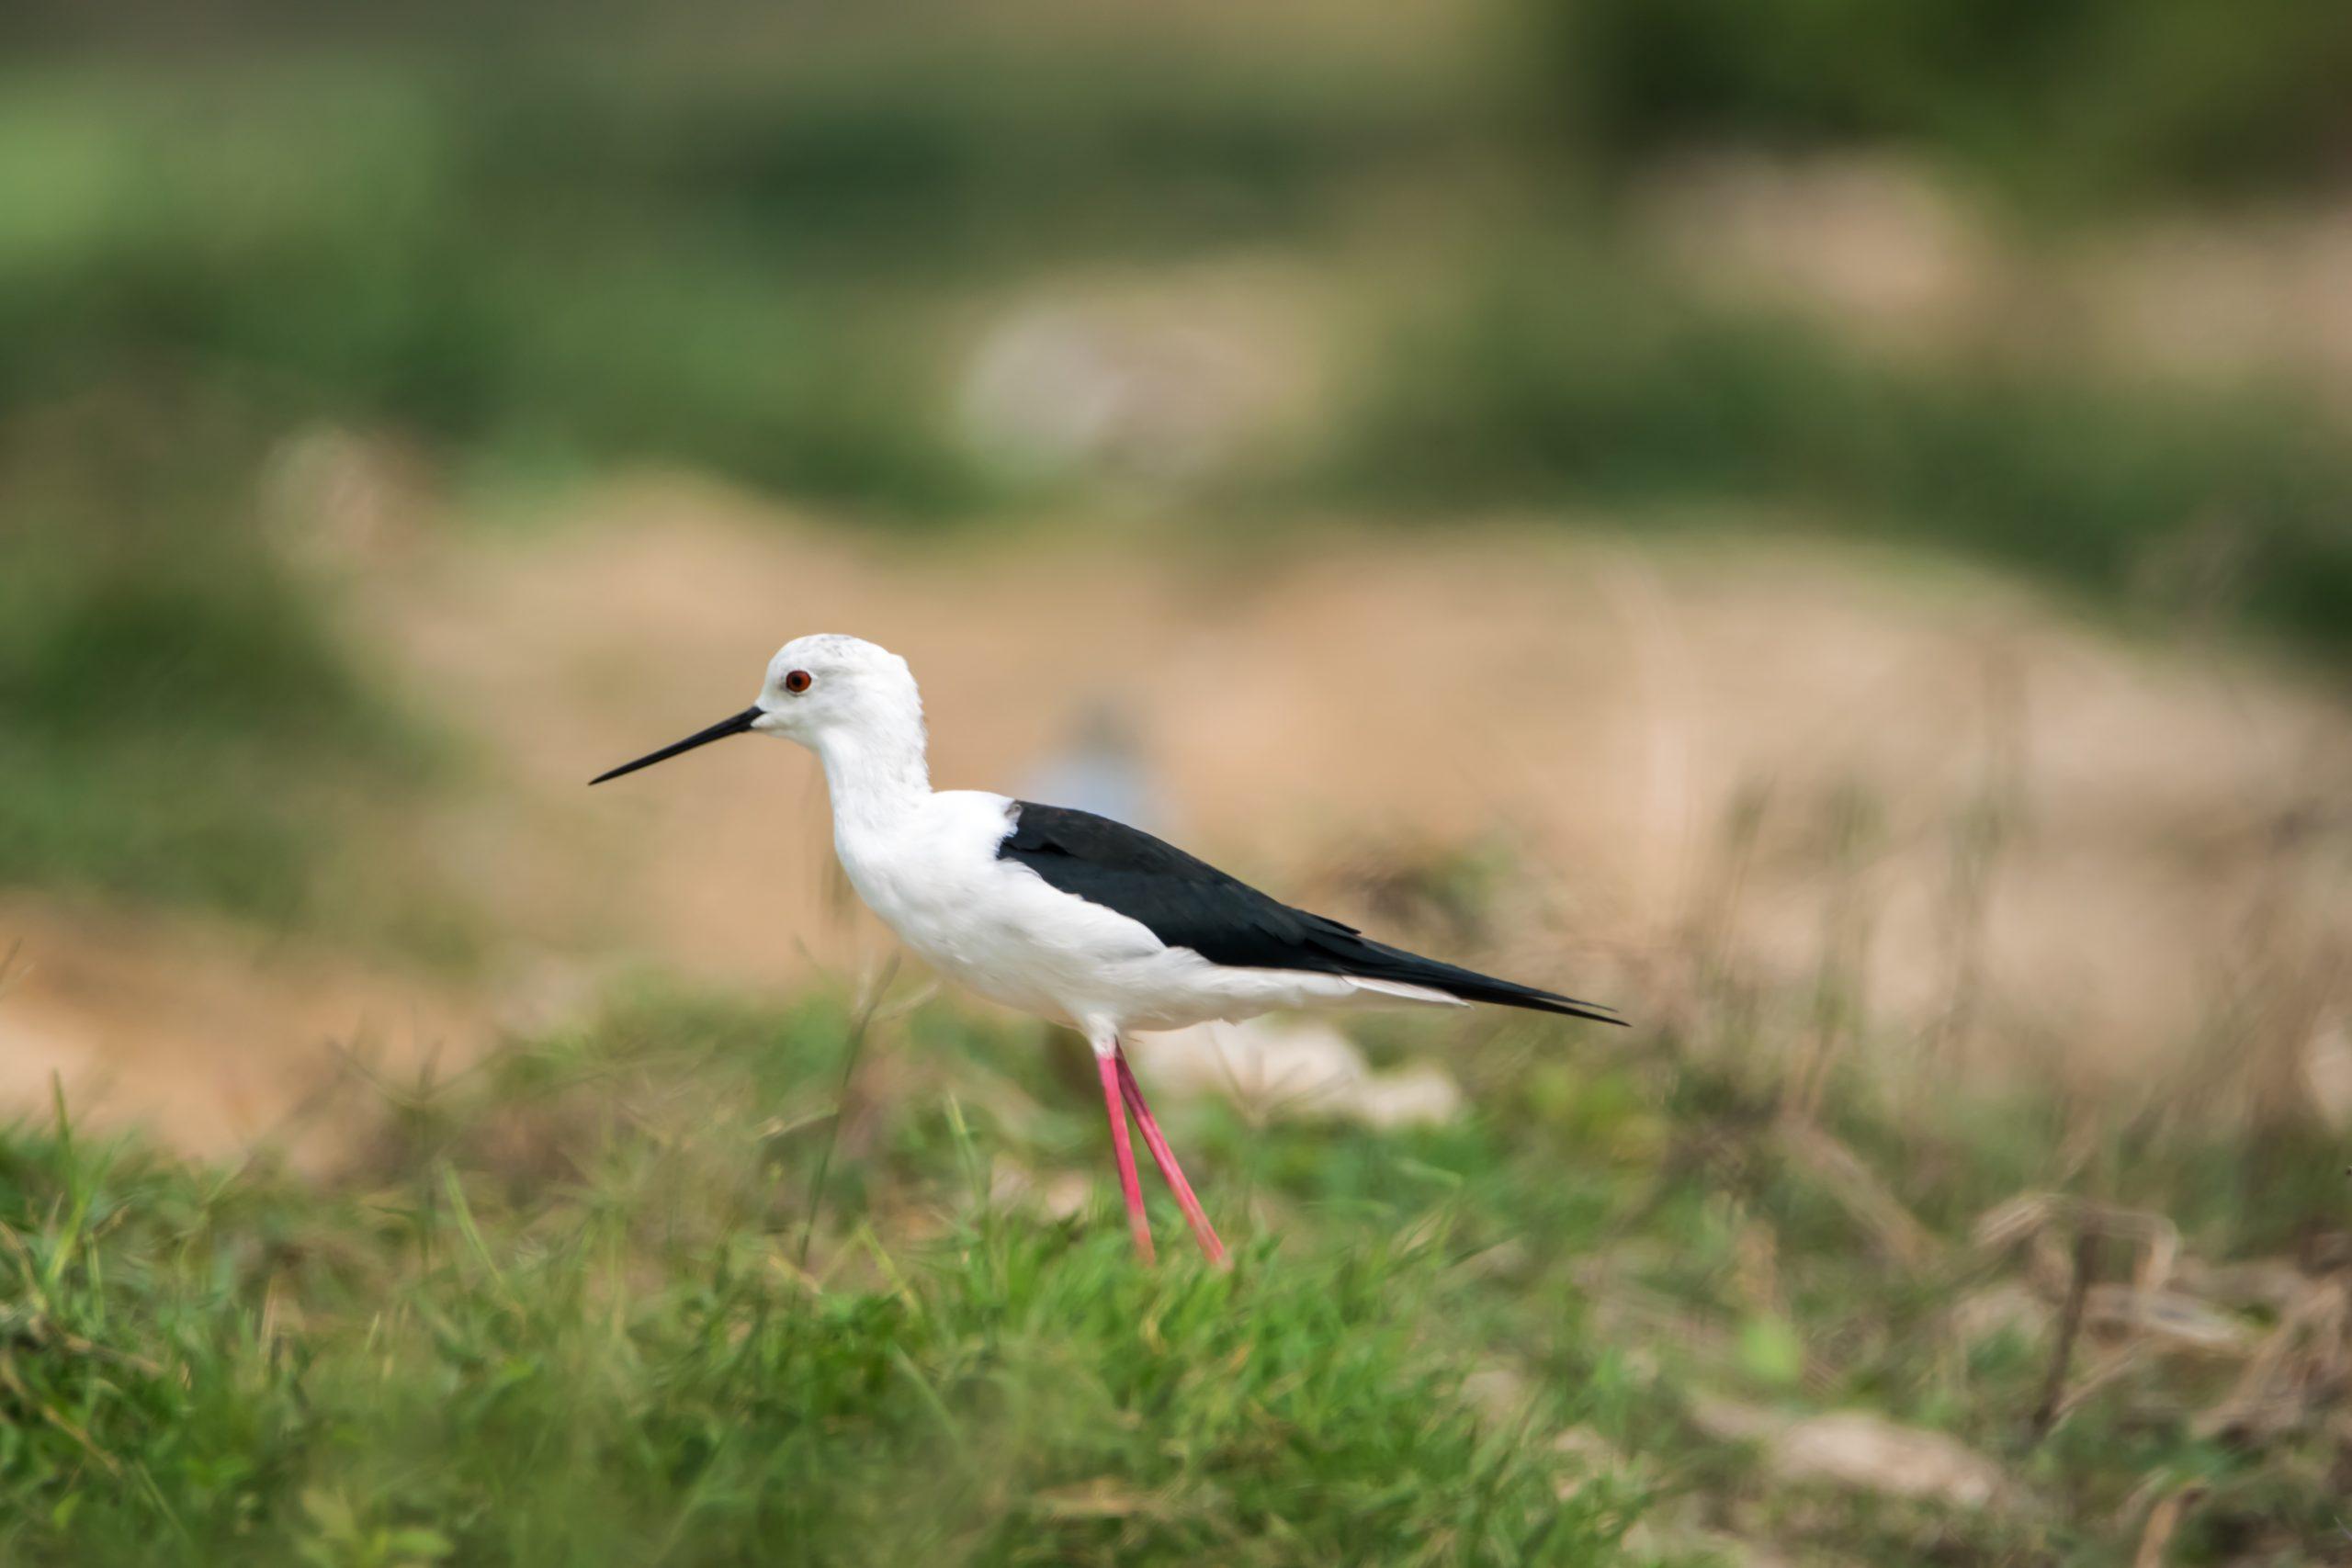 Bird in the grassy field